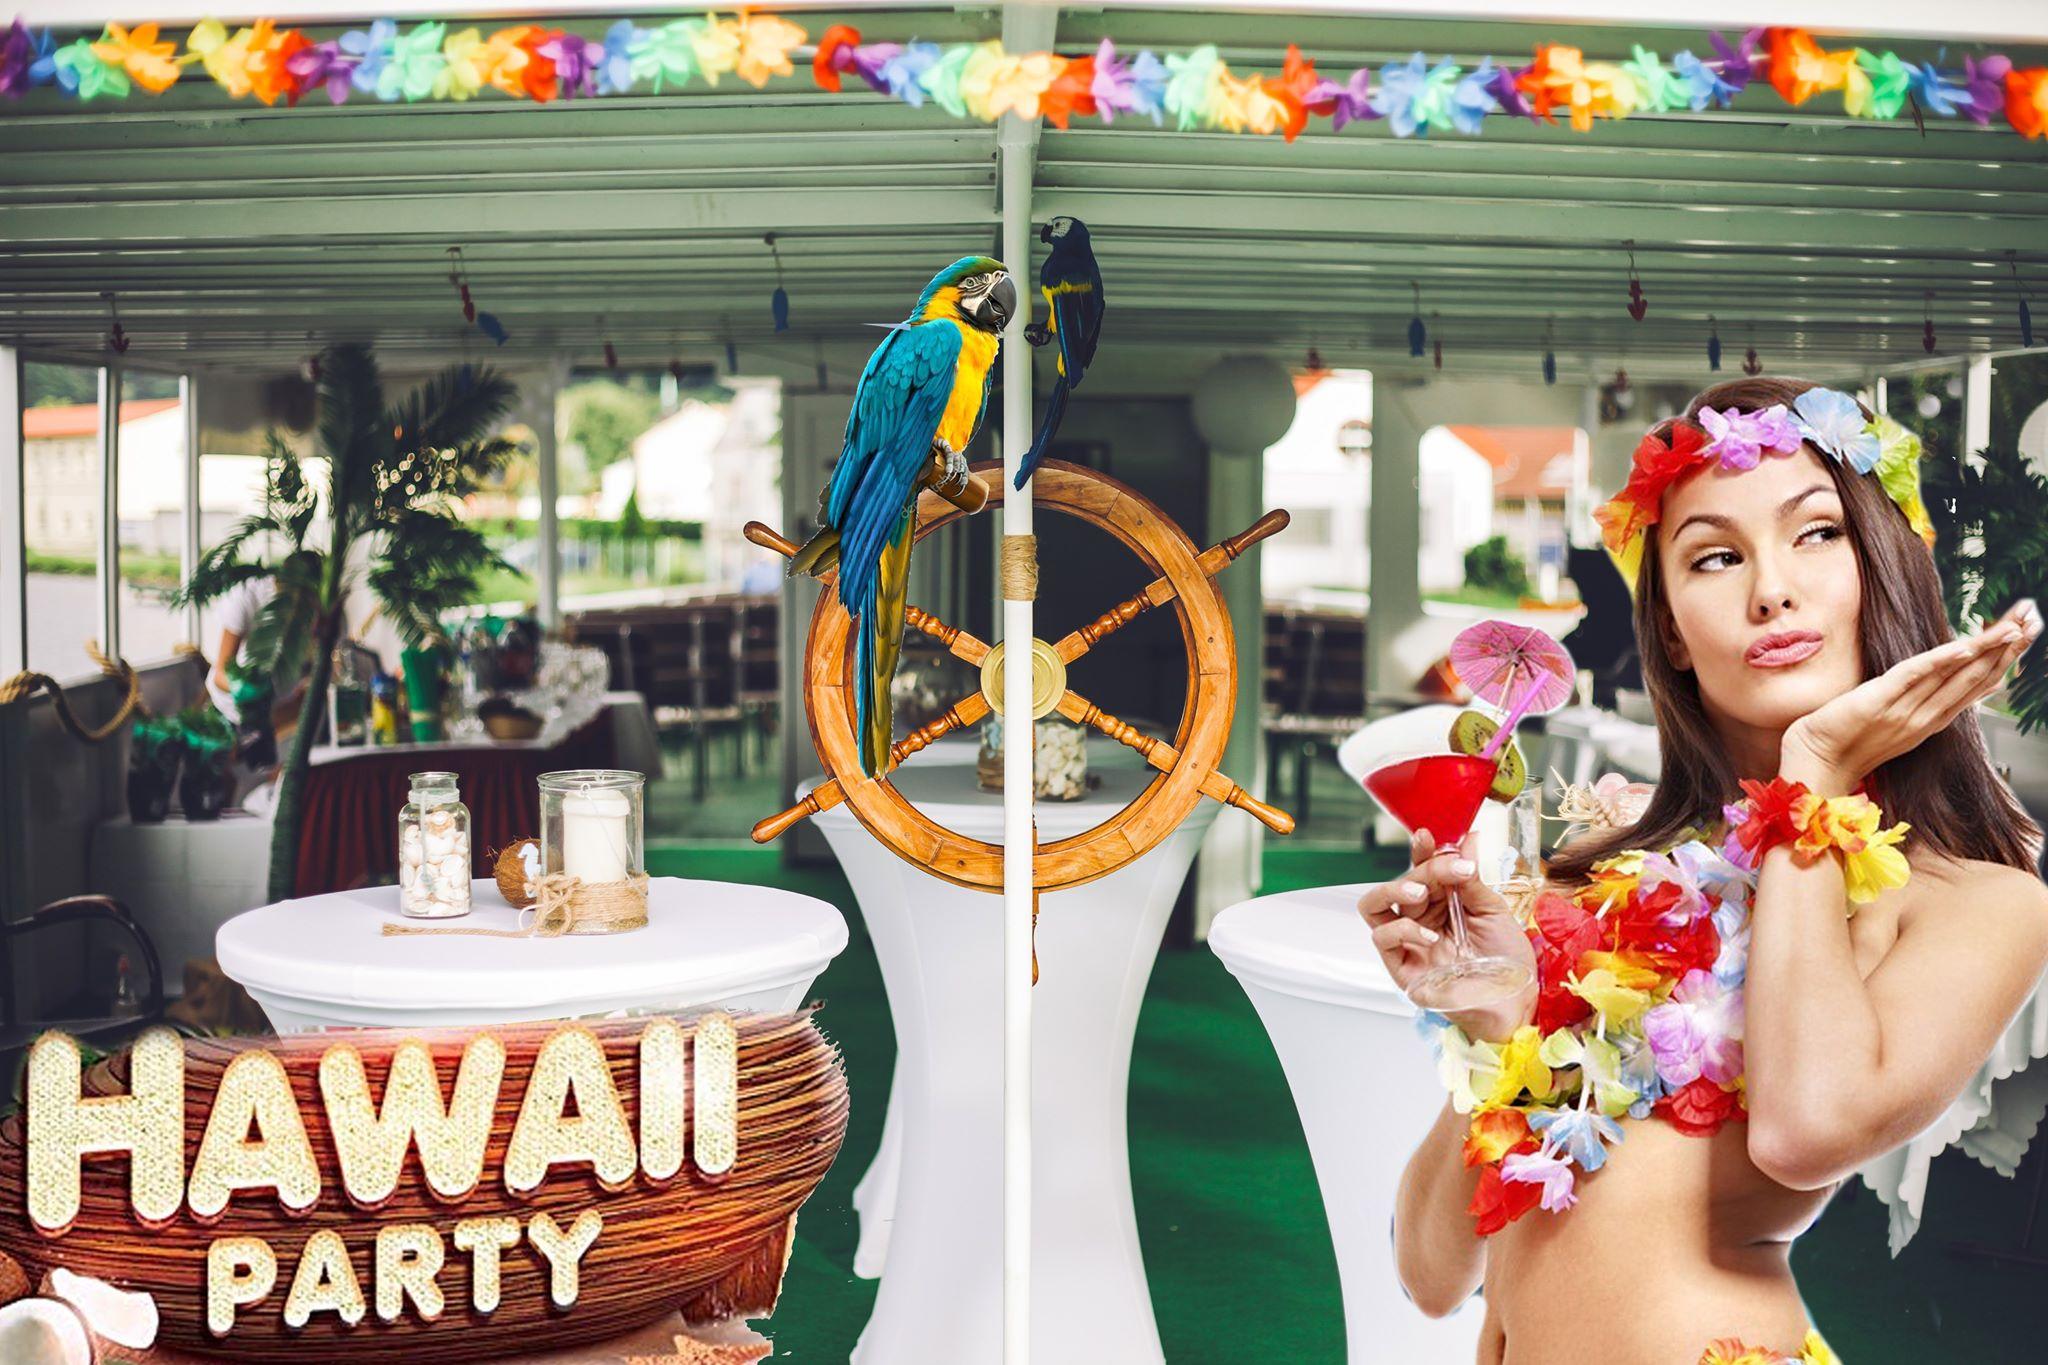 Hawai párty v Ústí nad Labem